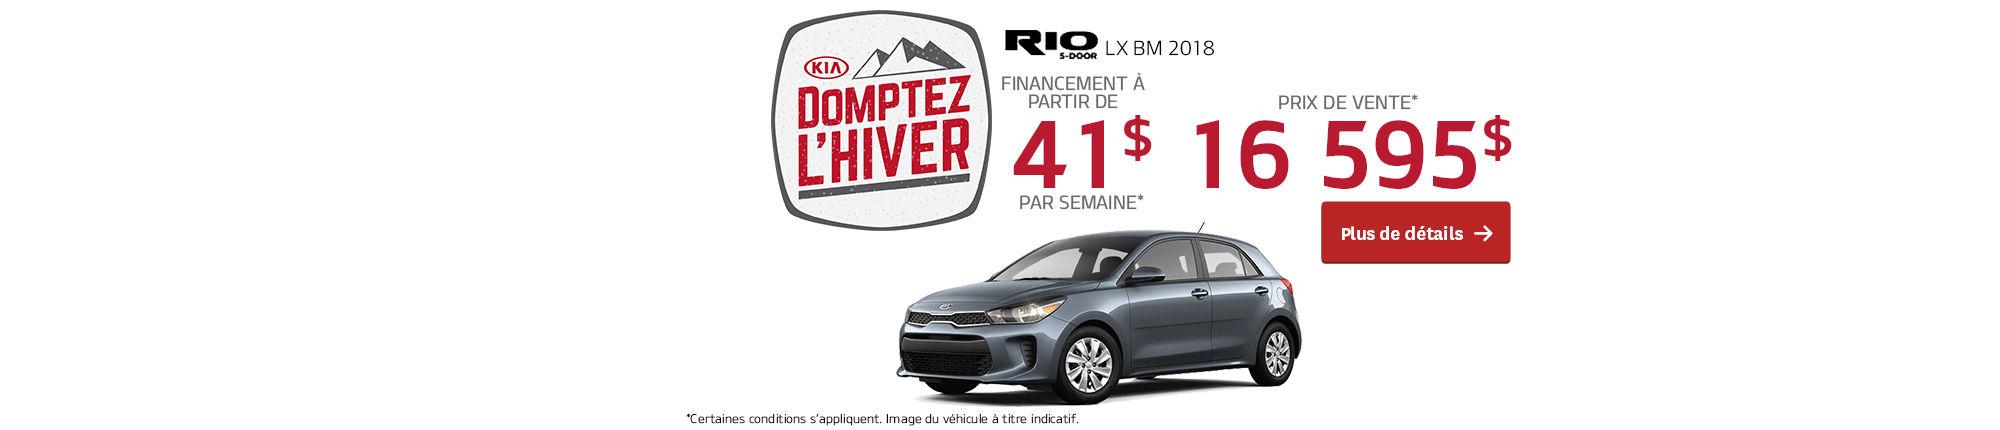 Rio 5 portes - header